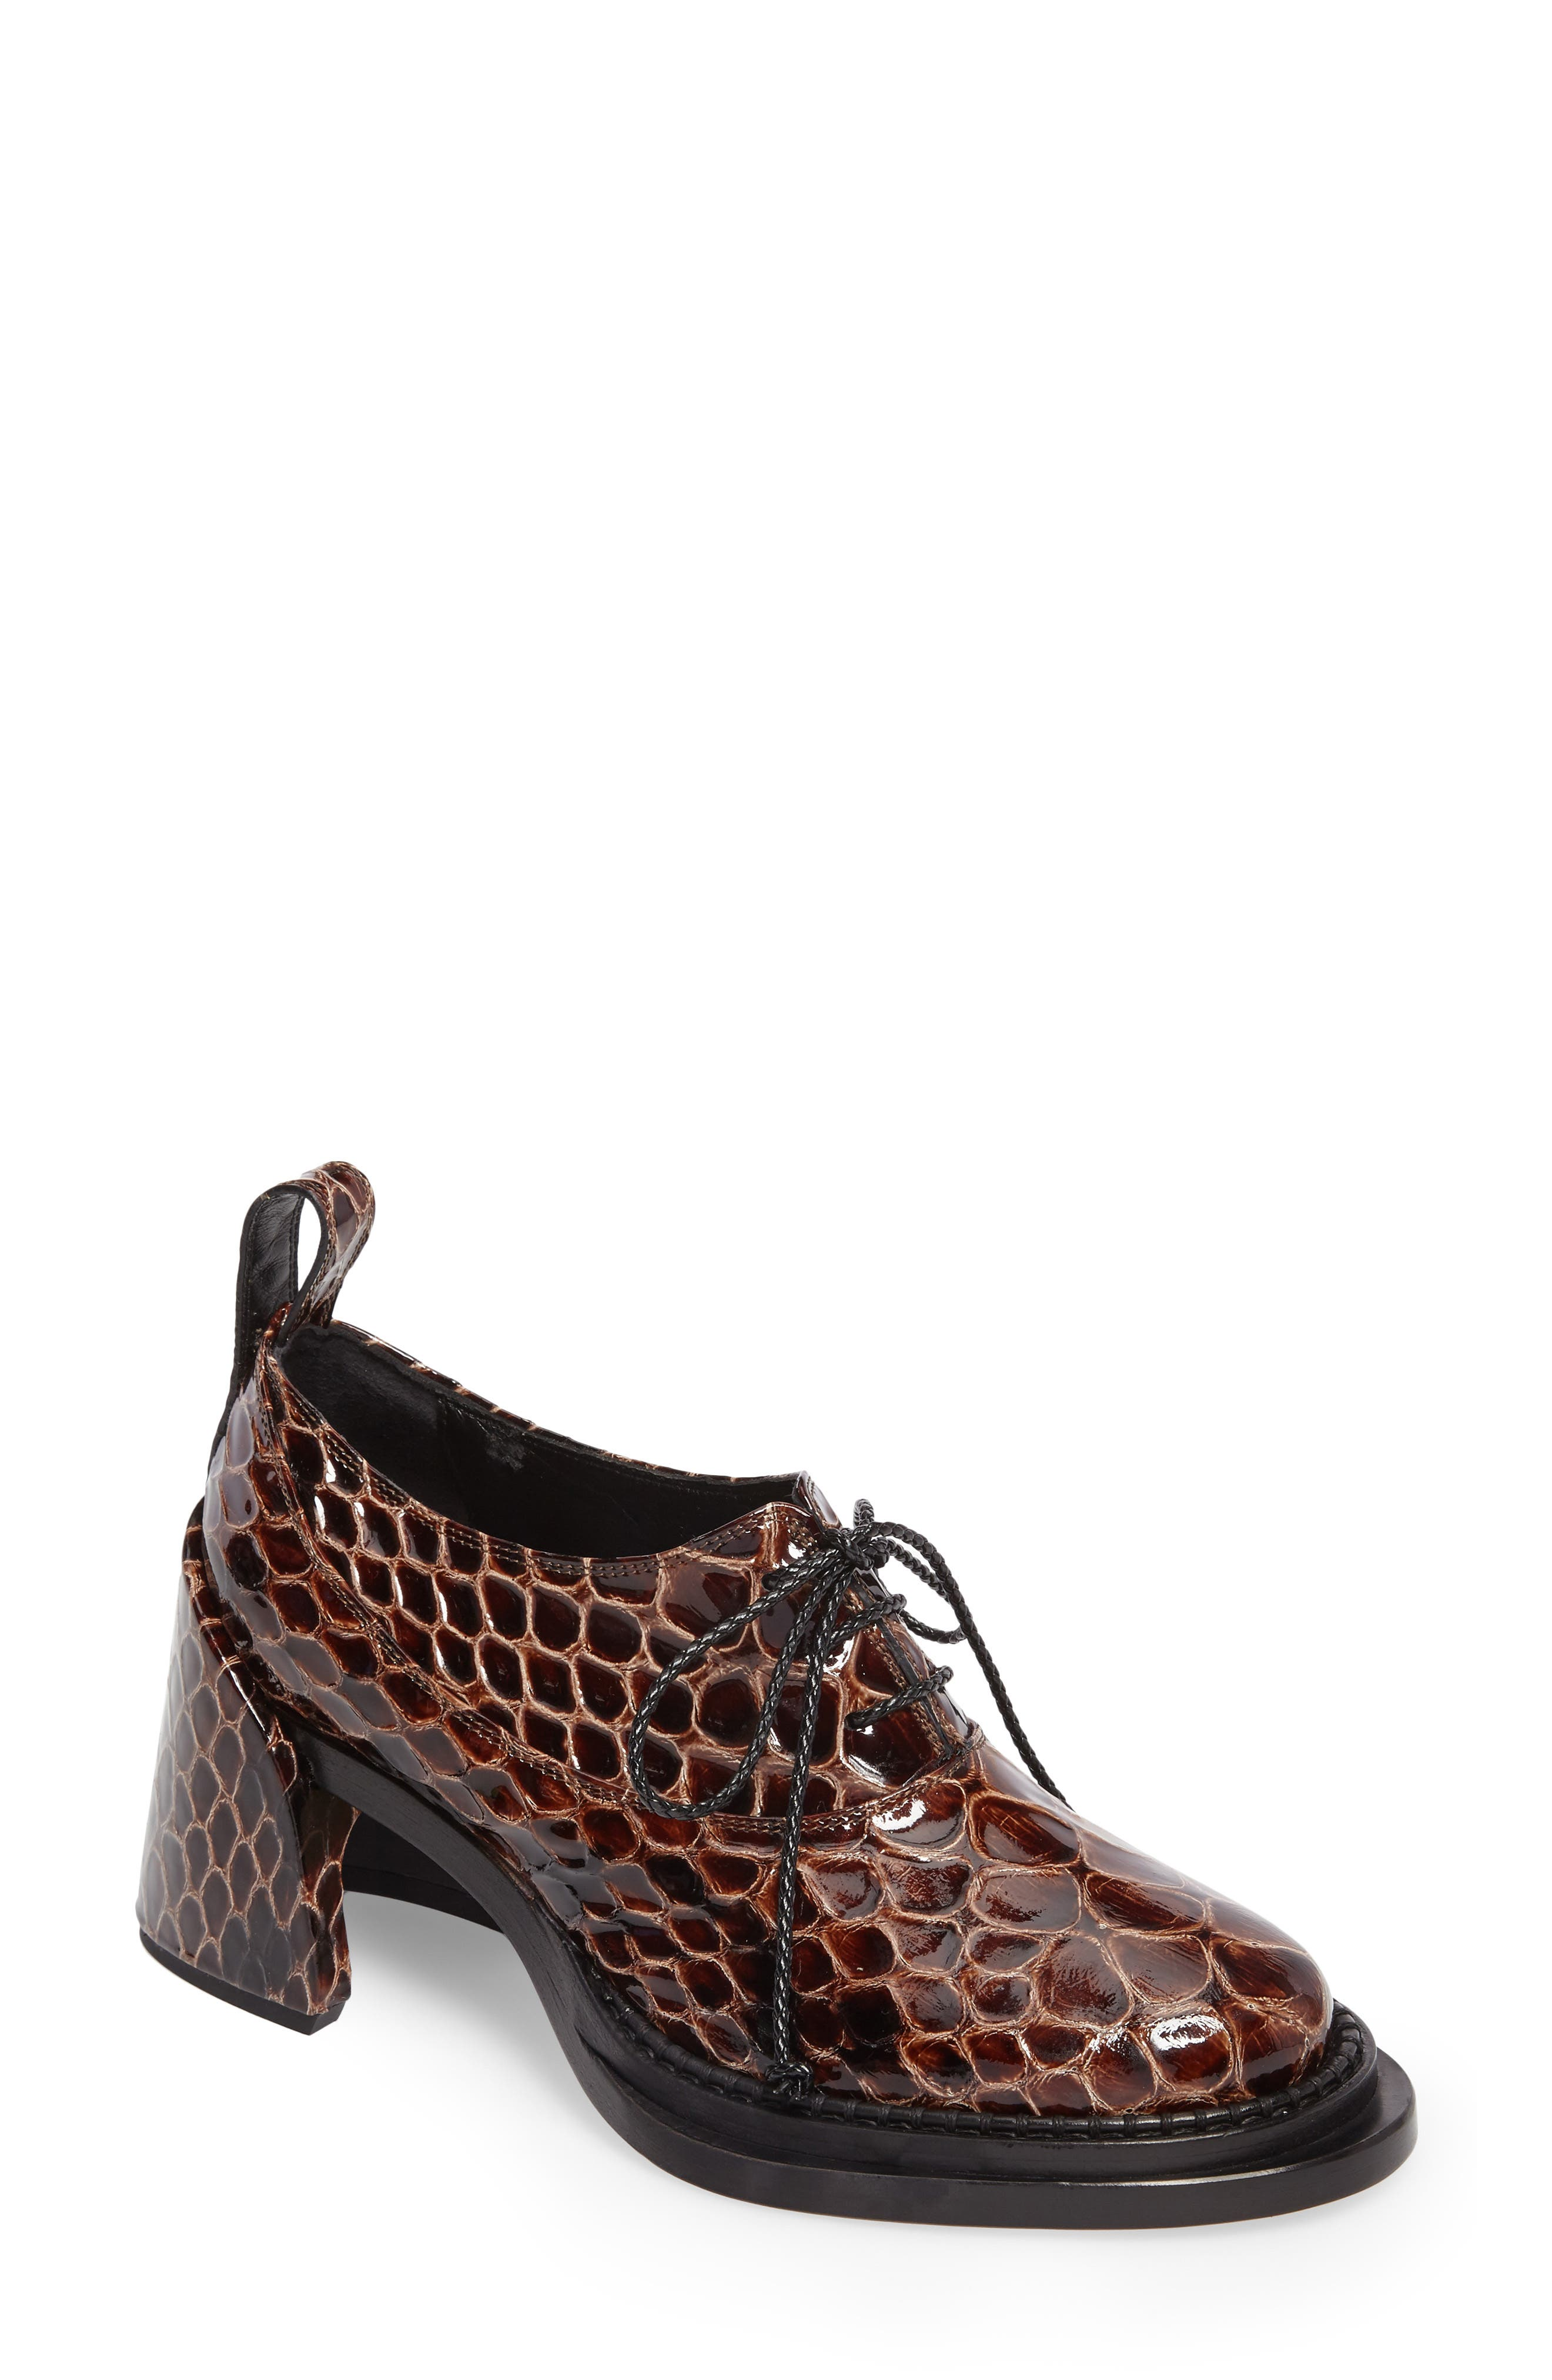 Simone Rocha Shell Heel Snake Embossed Leather Oxford (Women)